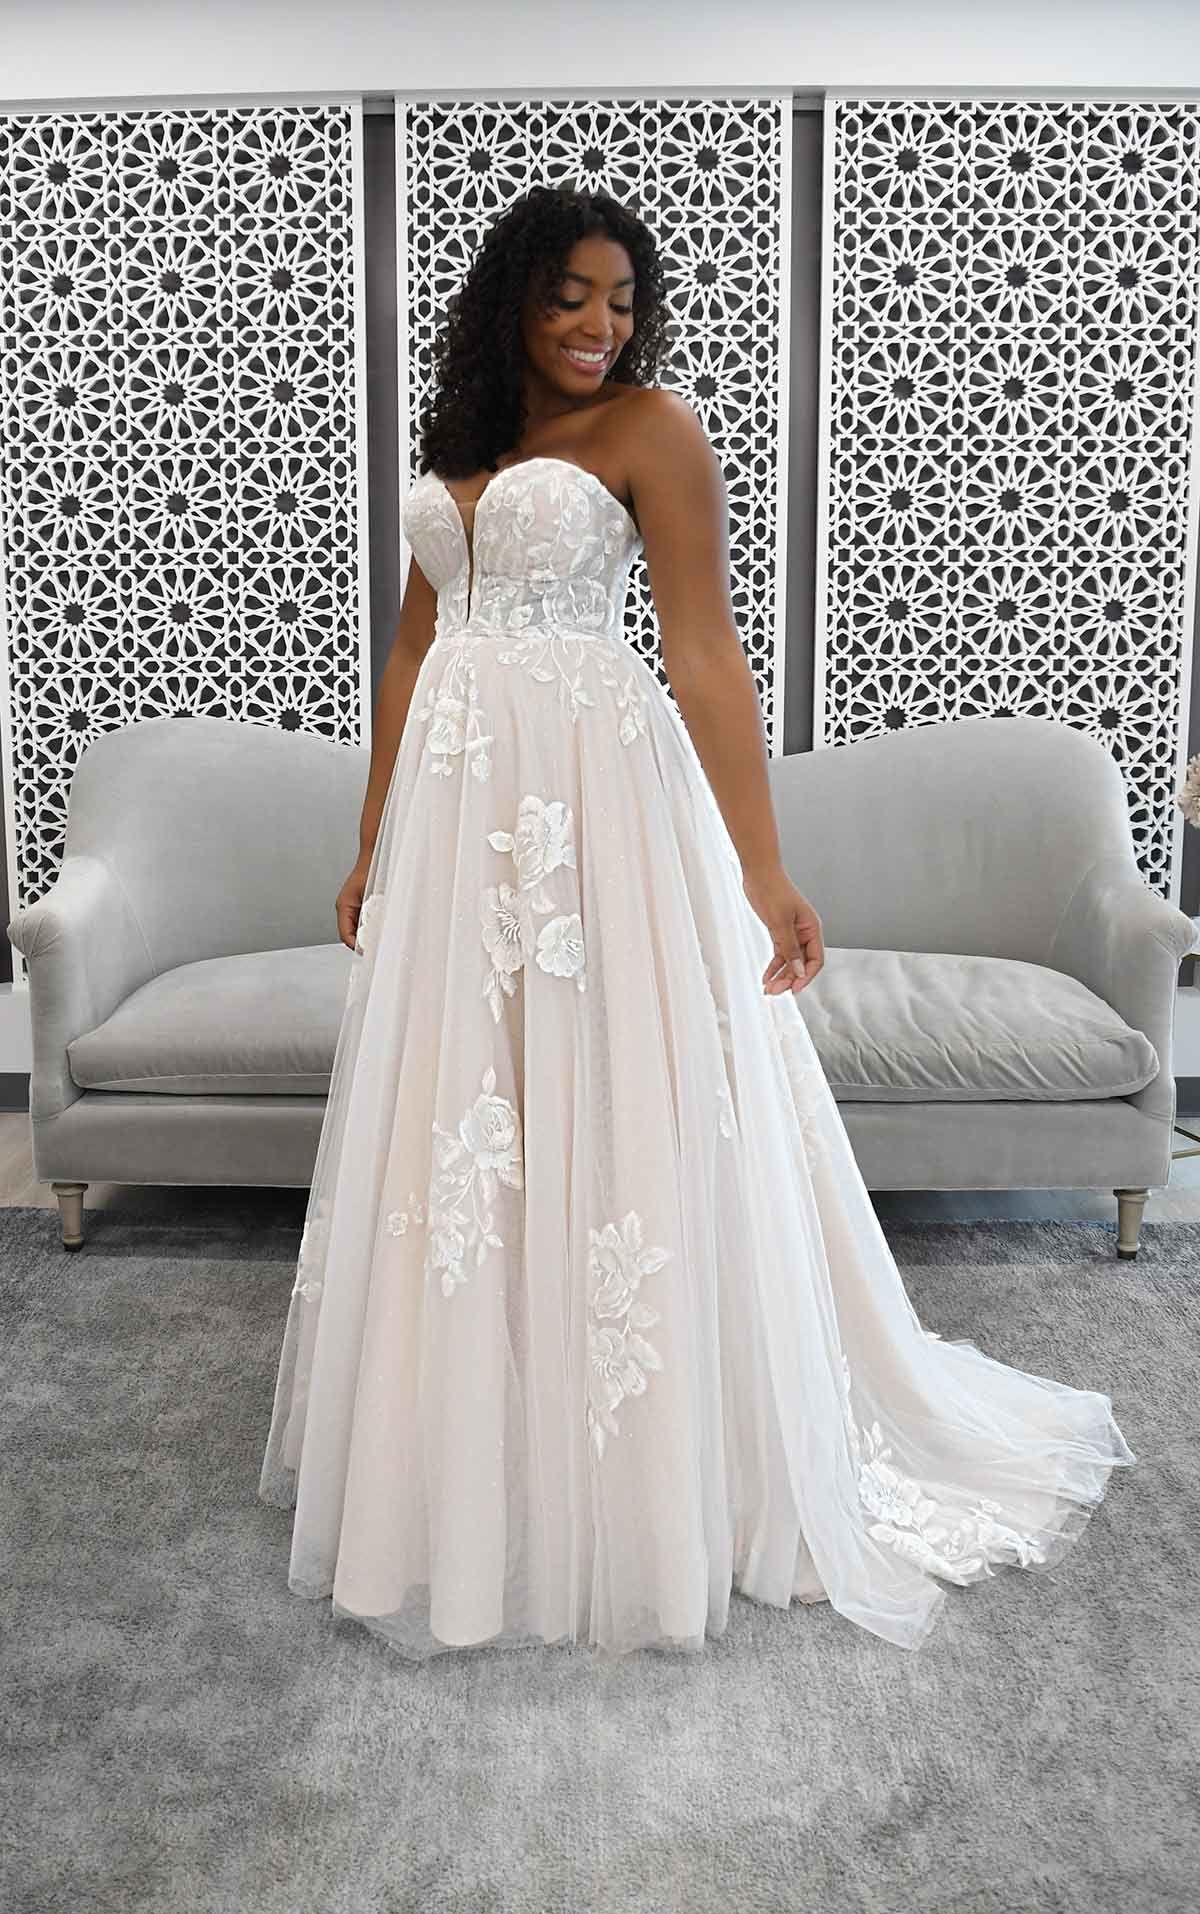 Romantic Strapless Wedding Dress With Sparkle Stella York Wedding Dresses Strapless Wedding Dress Ballgown Ball Gown Wedding Dress York Wedding Dress [ 1914 x 1200 Pixel ]